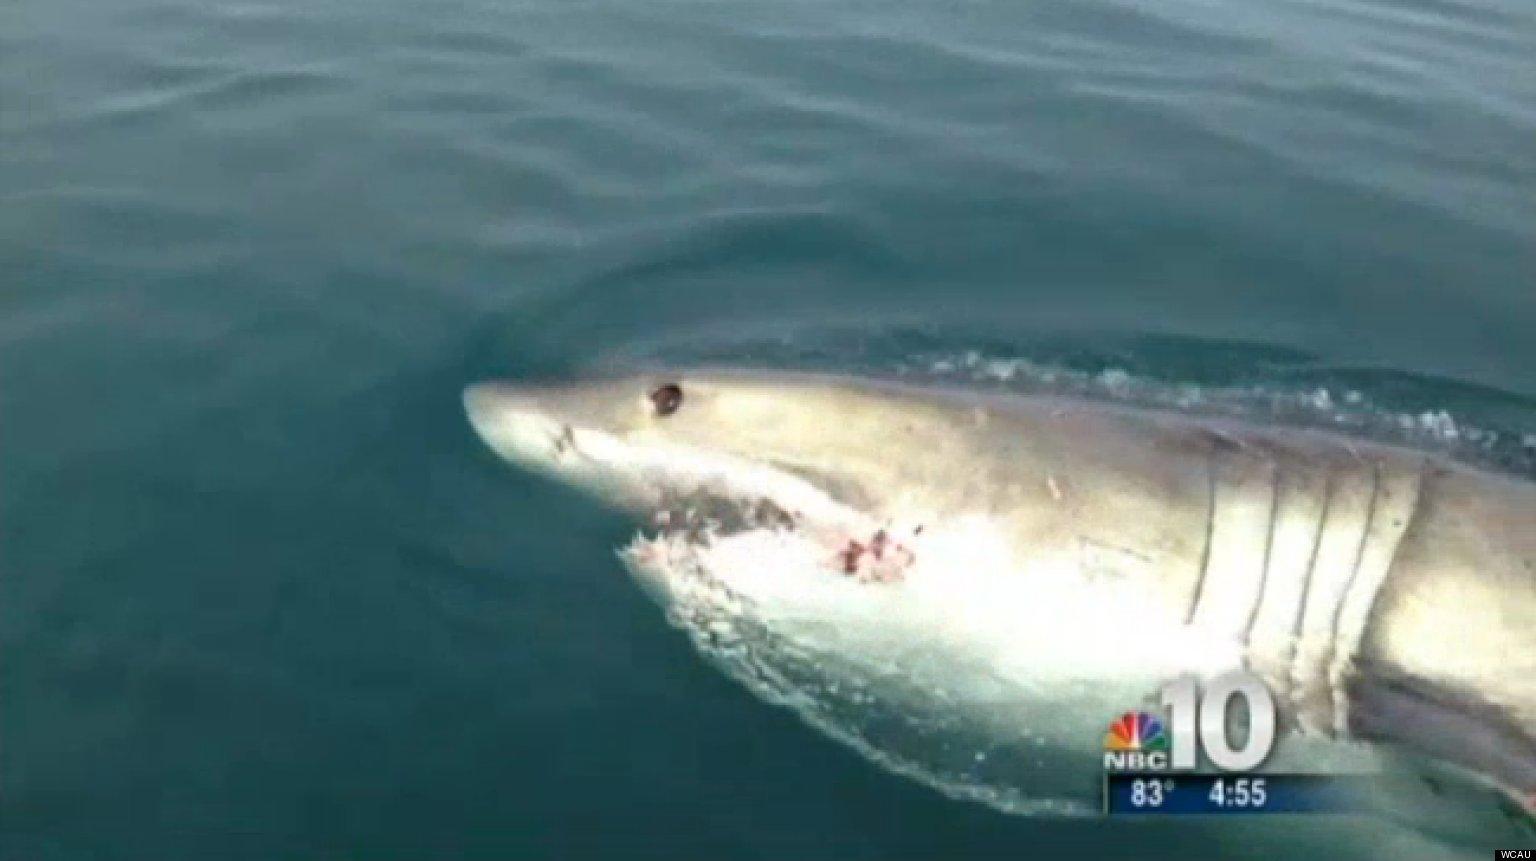 Great white shark seen off new jersey coast video huffpost for Shark fishing nj